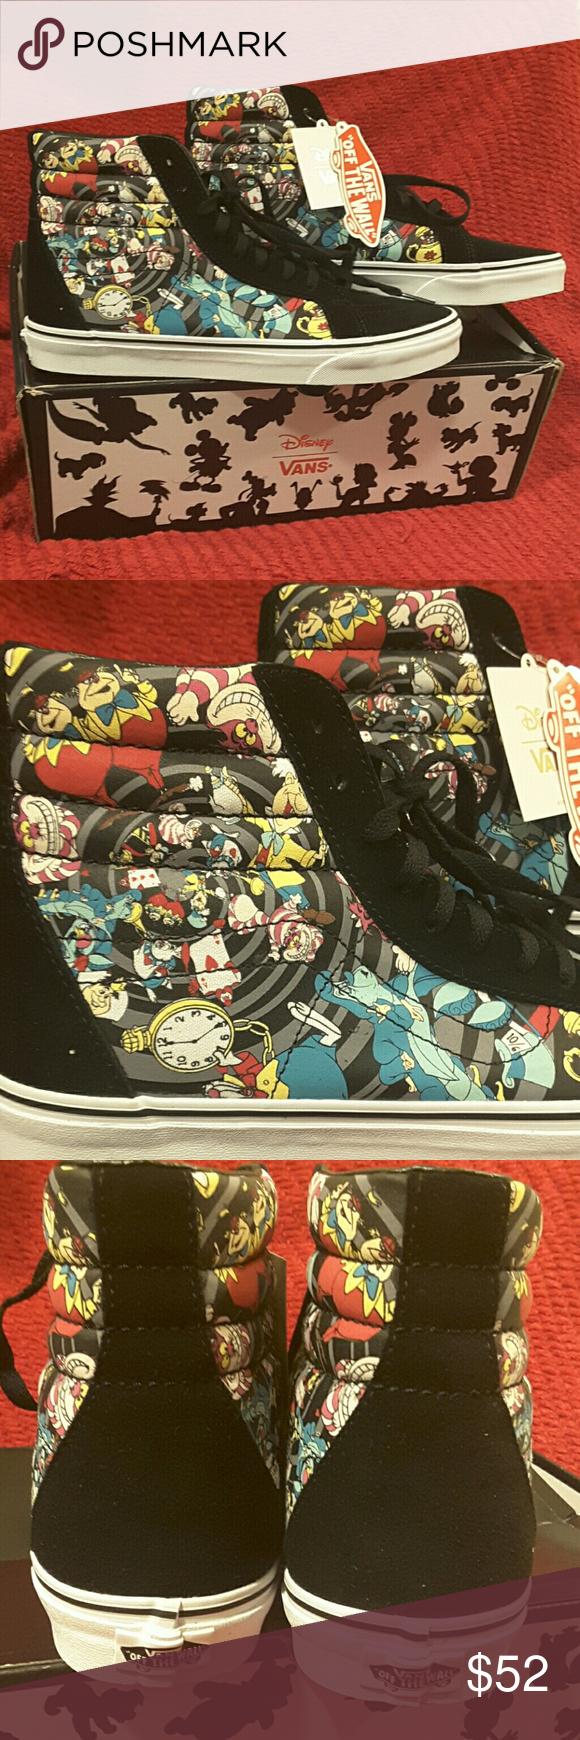 970e186ca60e13 Vans Rabbit Hole Alice in Wonderland Sneakers Vans SK8-Hi Reissue Disney  Rabbit Hole (Alice in Wonderland Sneakers. Women s size 11